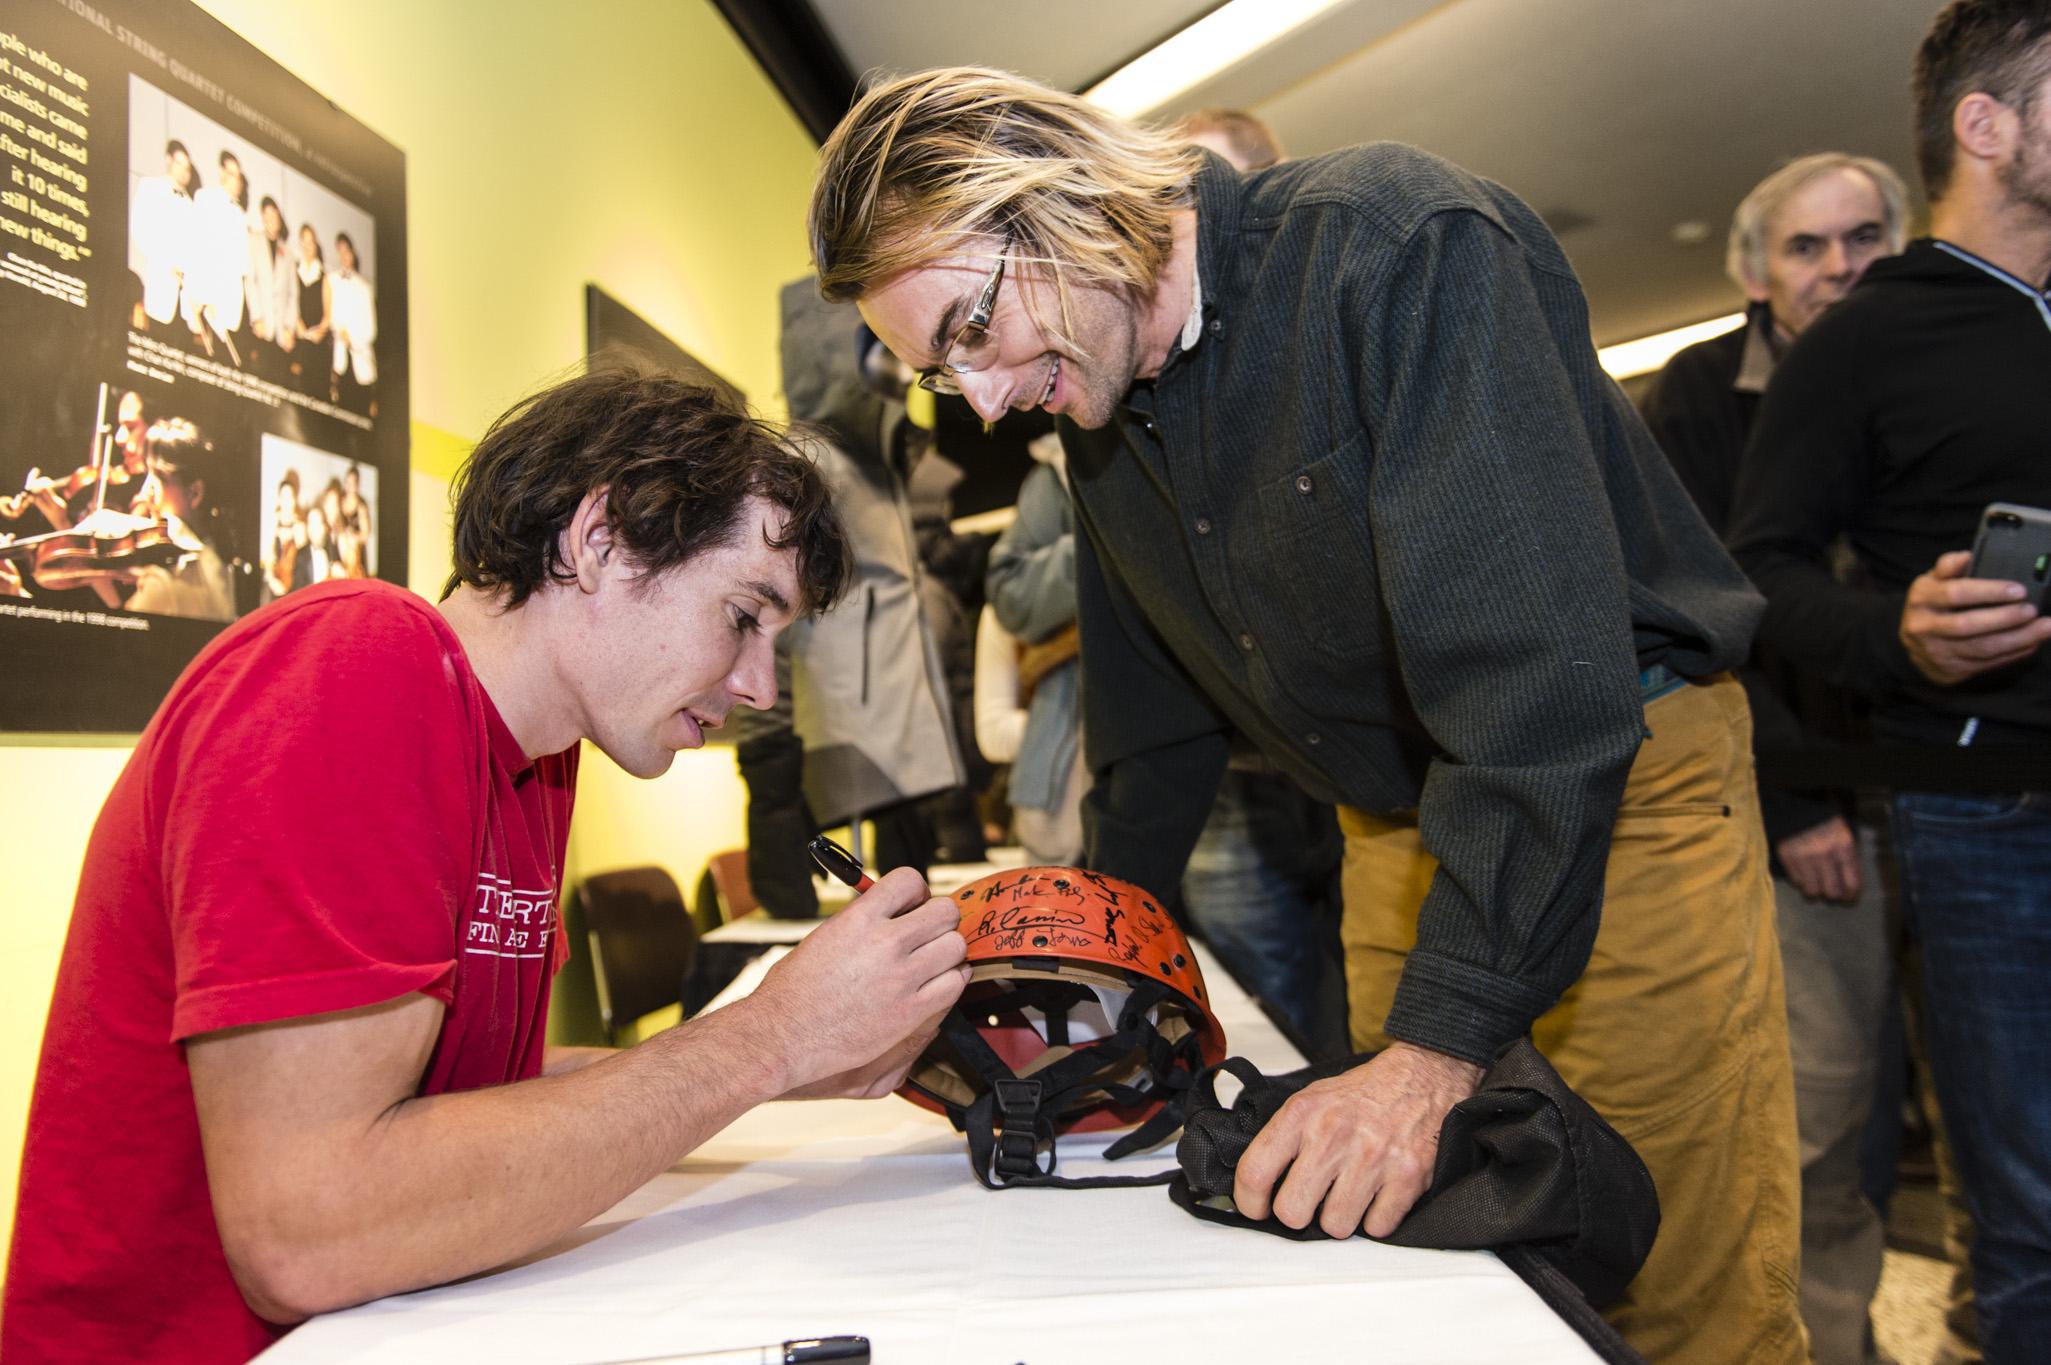 Alex Honnold signing hats by Rita Taylor.jpg